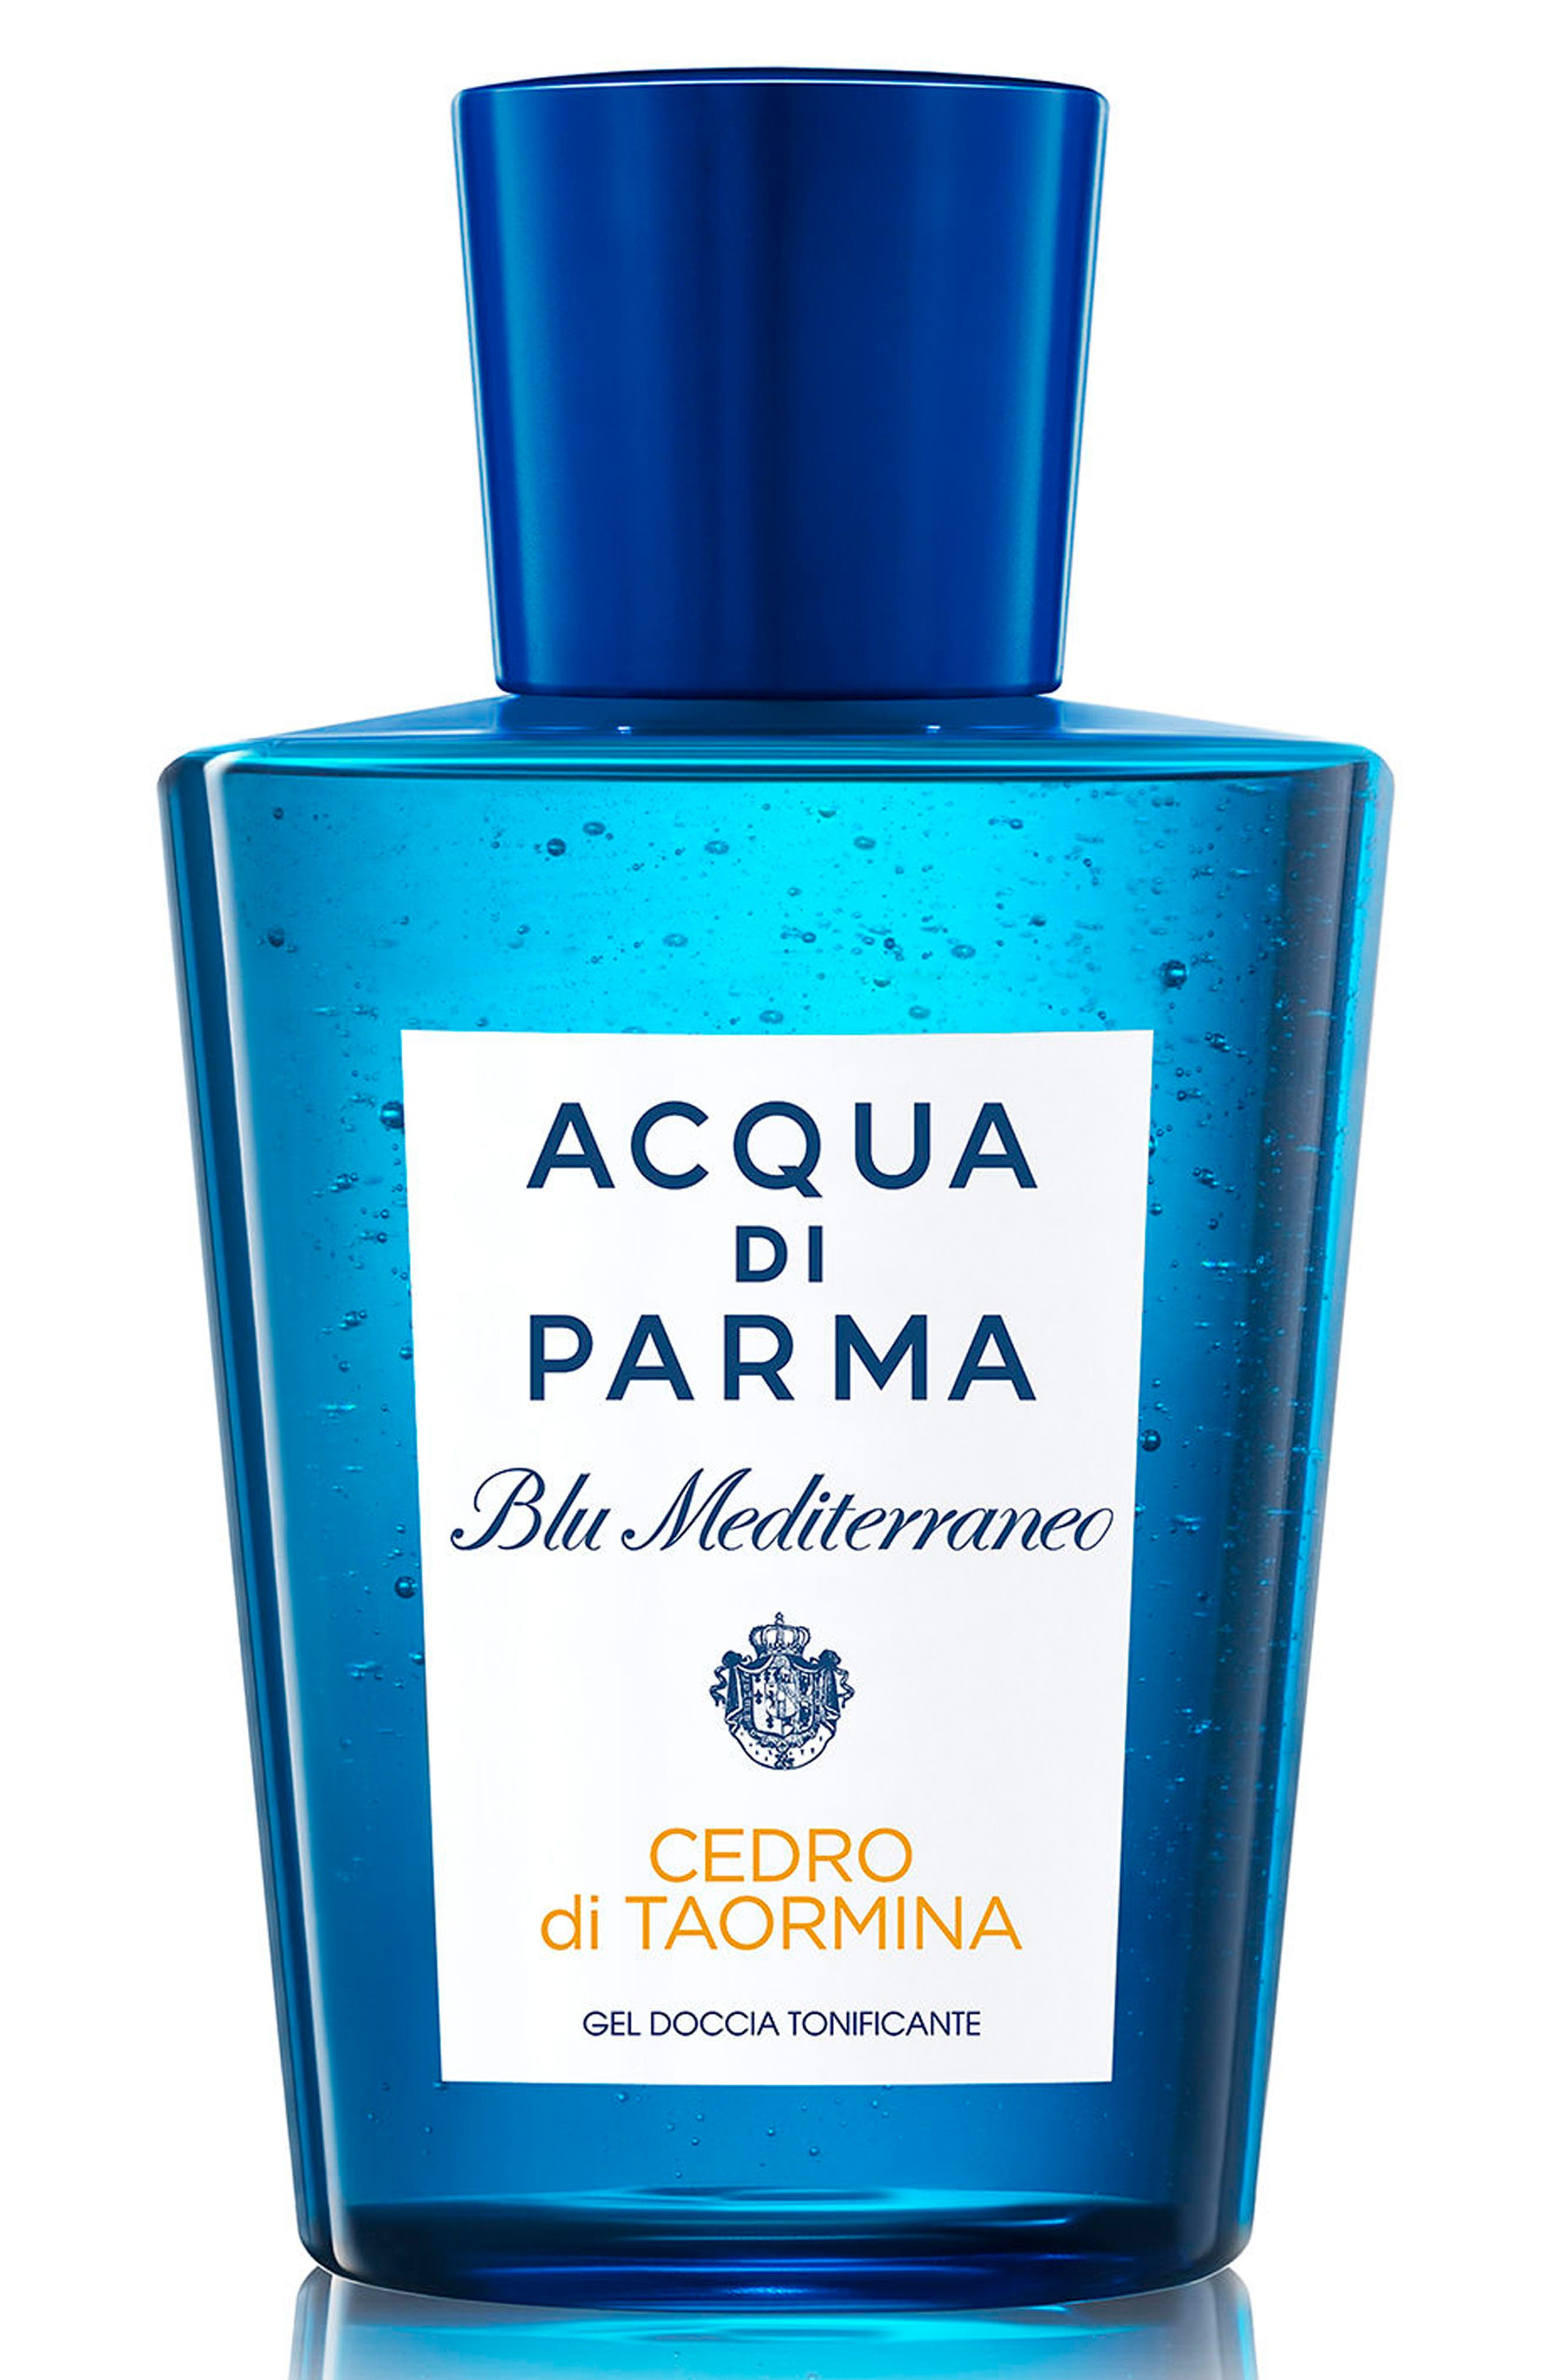 Main Image - Acqua di Parma 'Blu Mediterraneo Cedro di Taormina' Invigorating Shower Gel